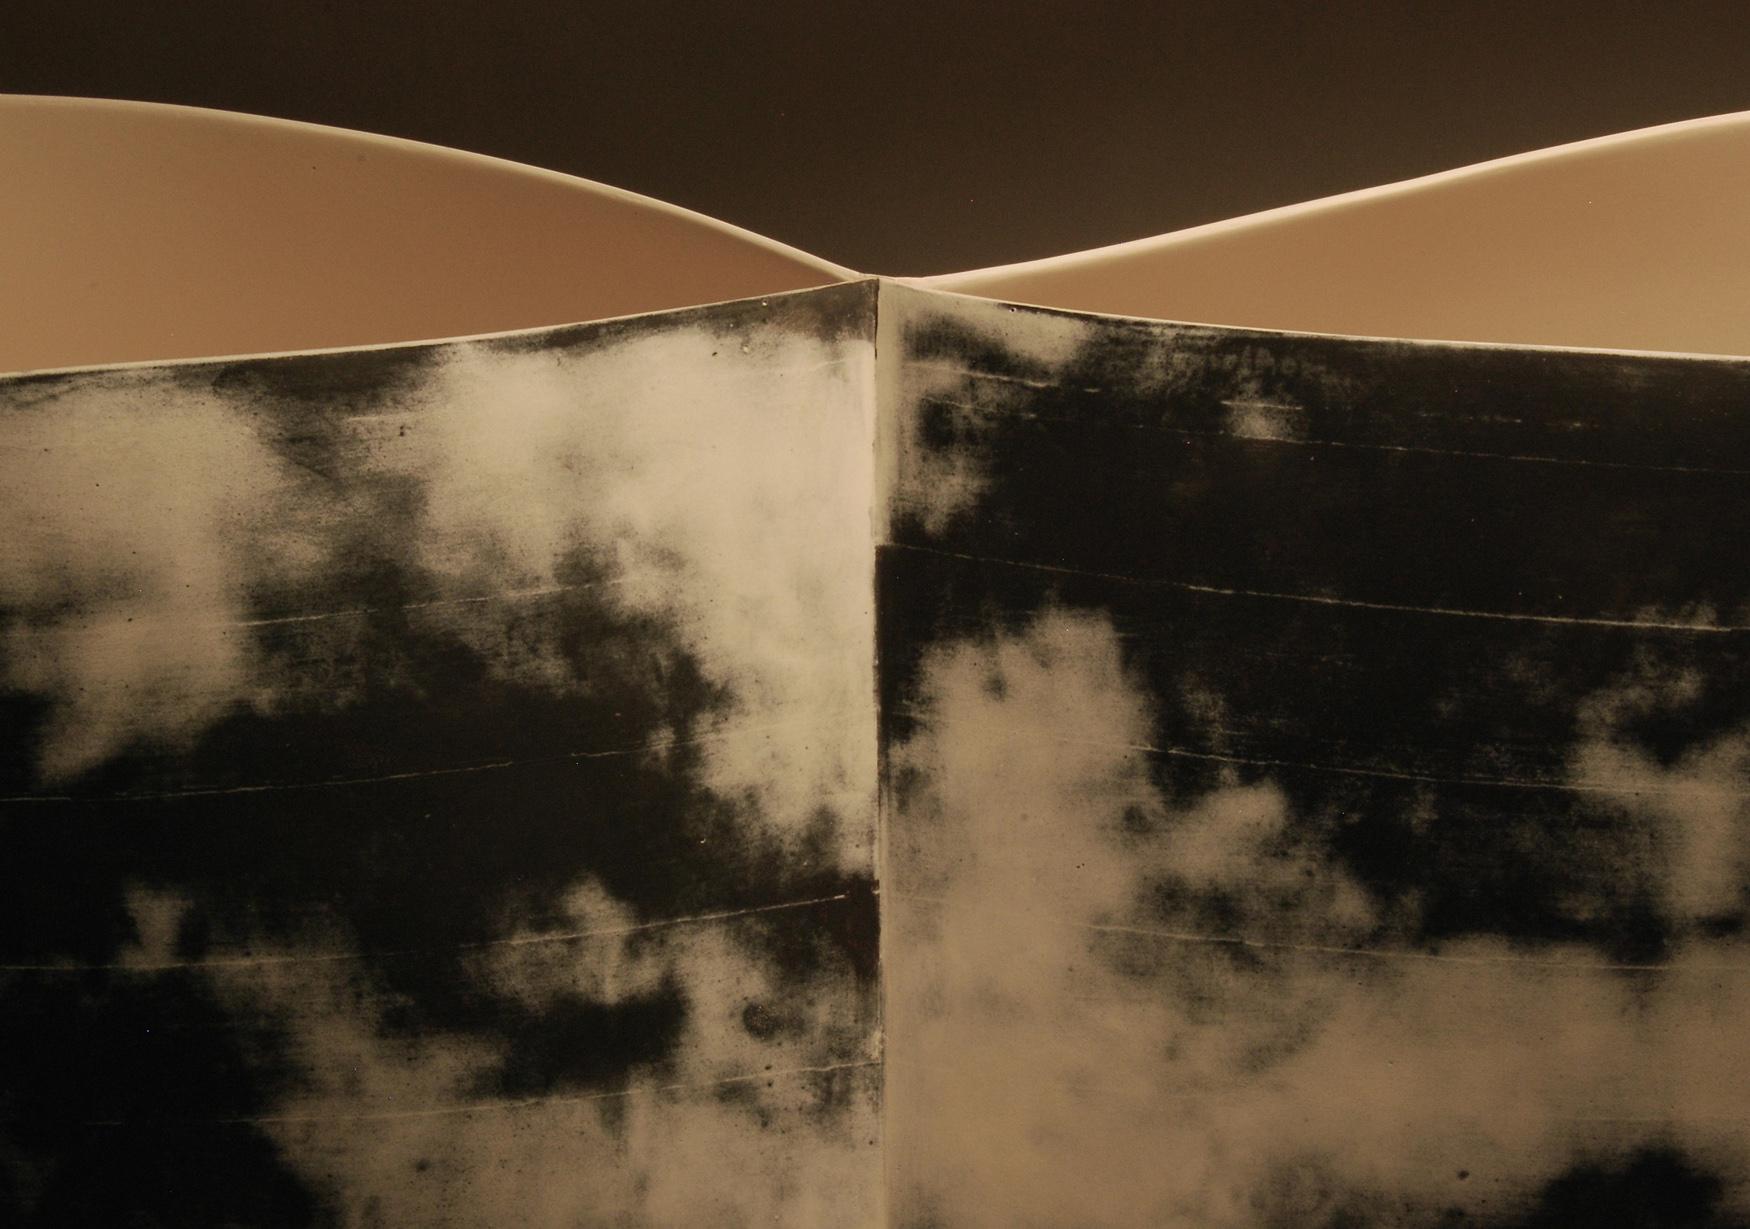 Event Horizon (detail)